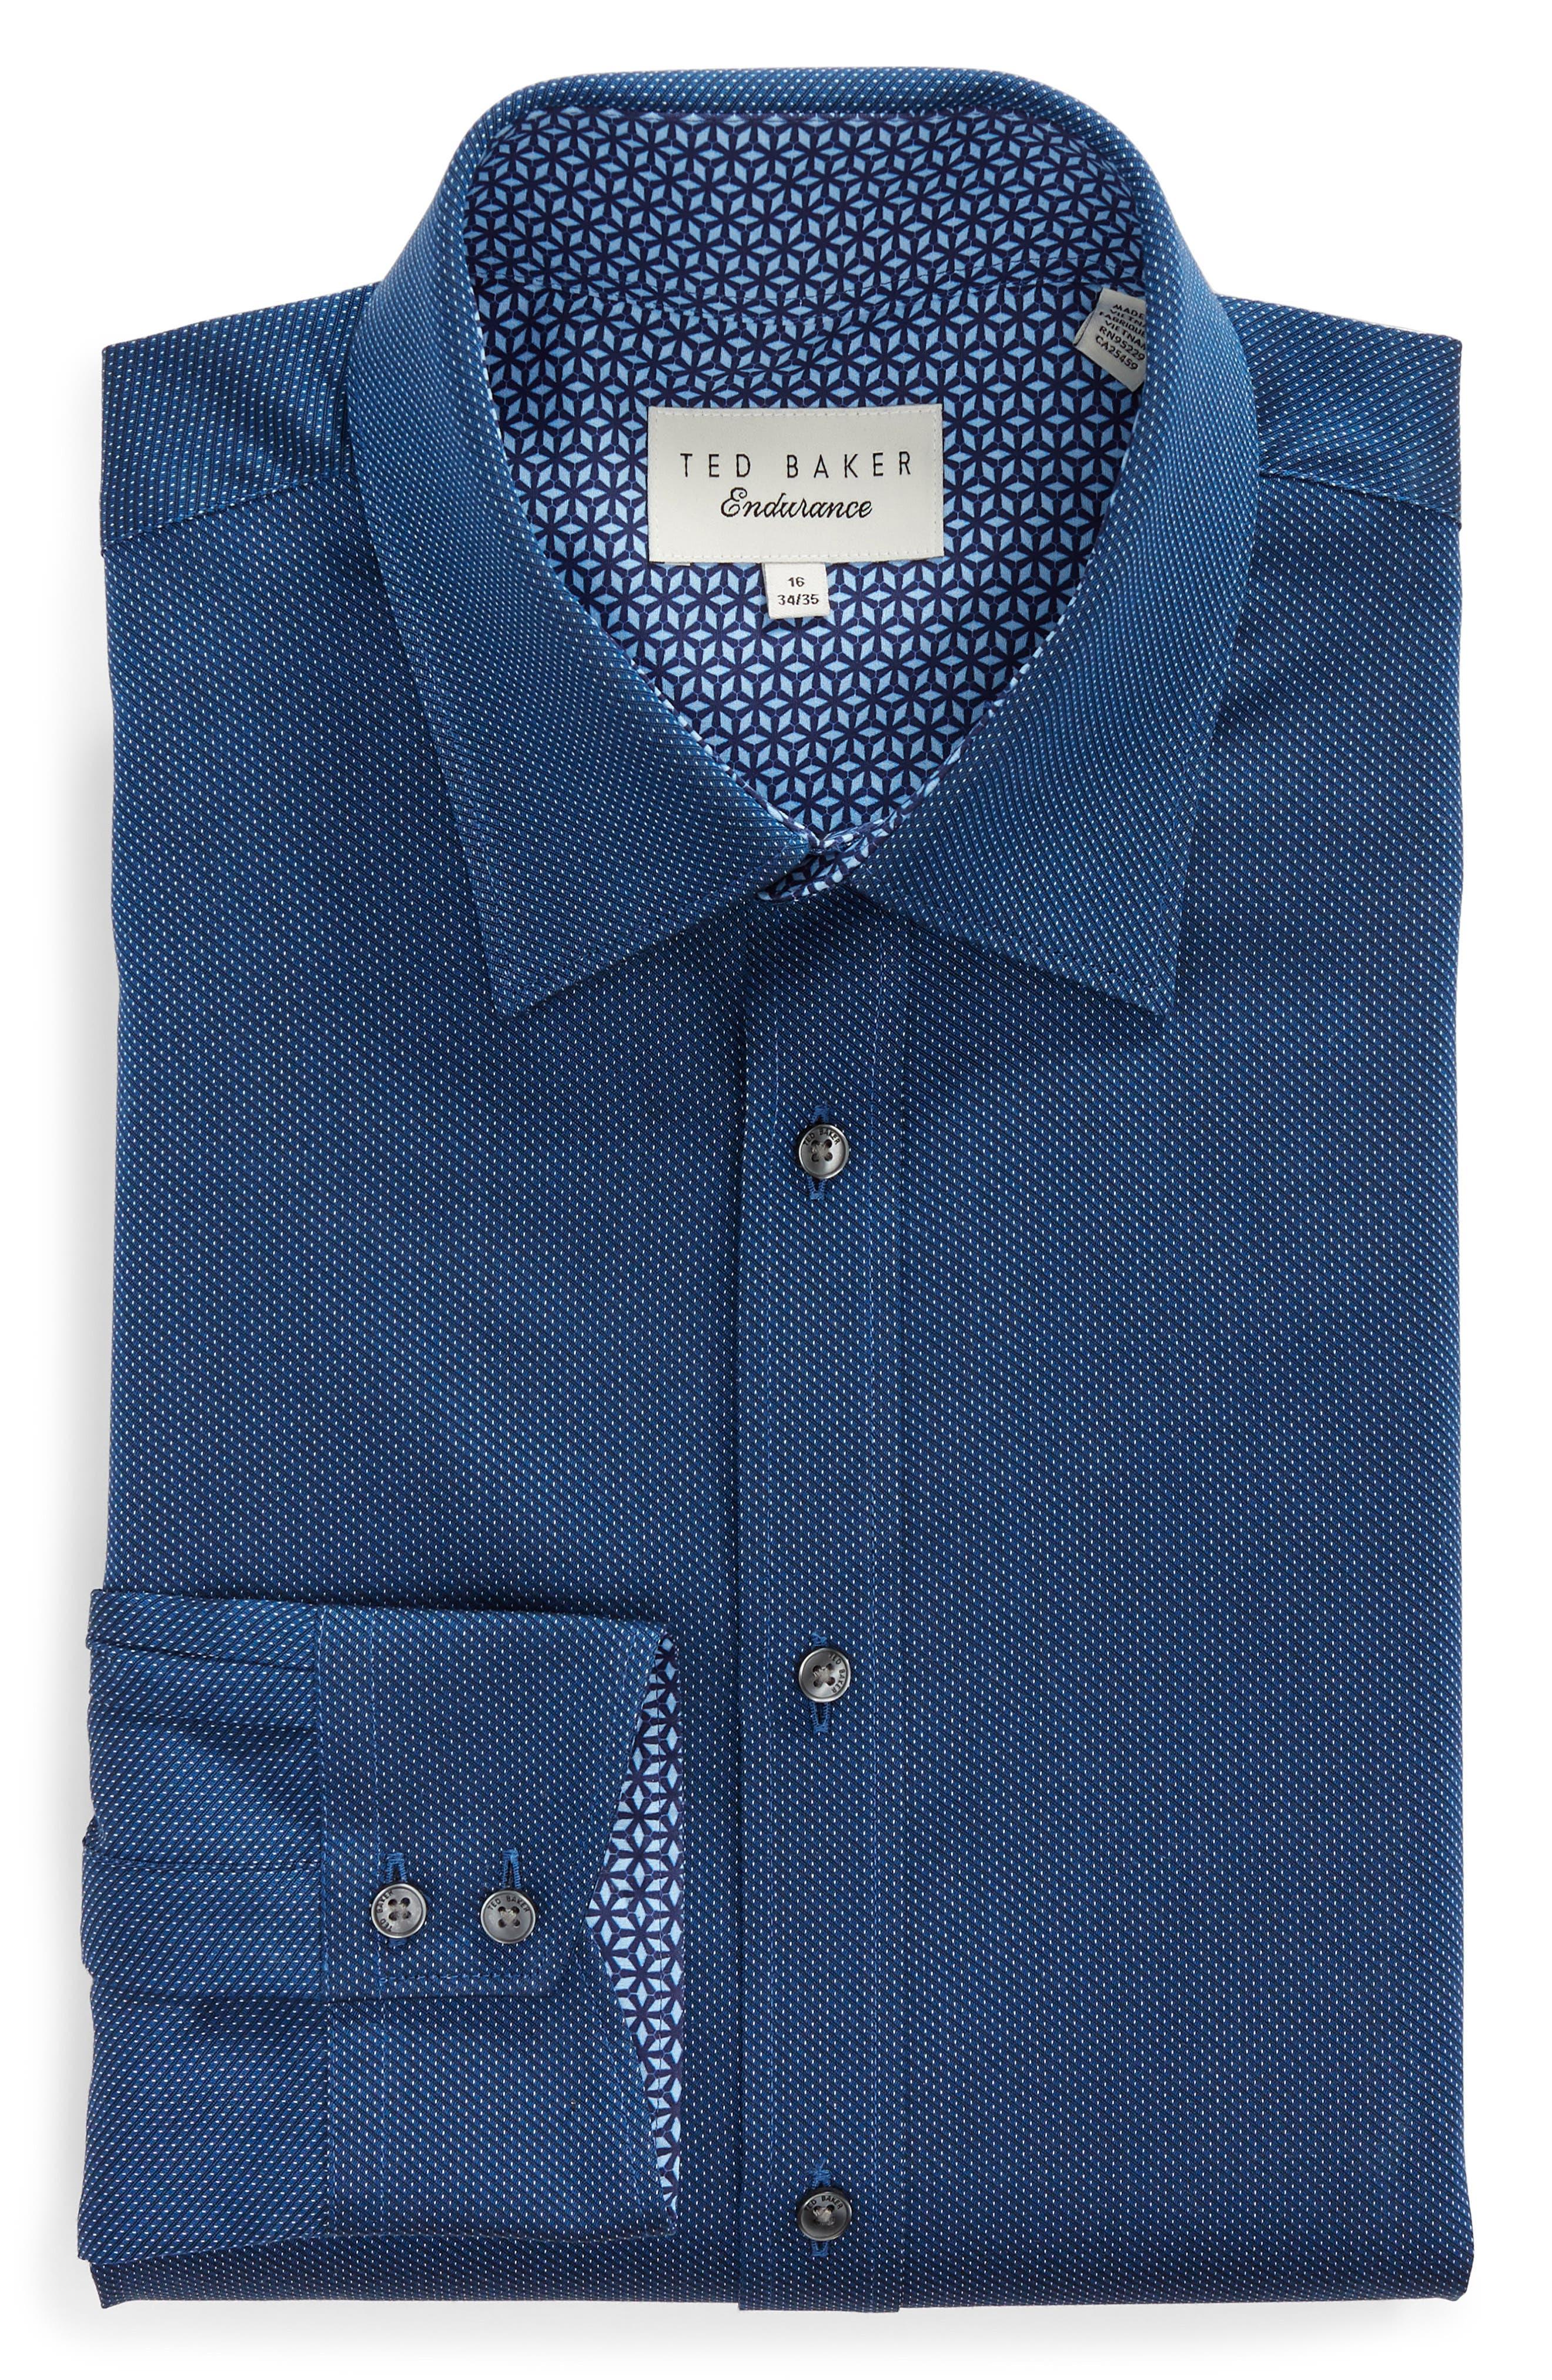 TED BAKER LONDON,                             Wikks Slim Fit Print Dress Shirt,                             Alternate thumbnail 5, color,                             410